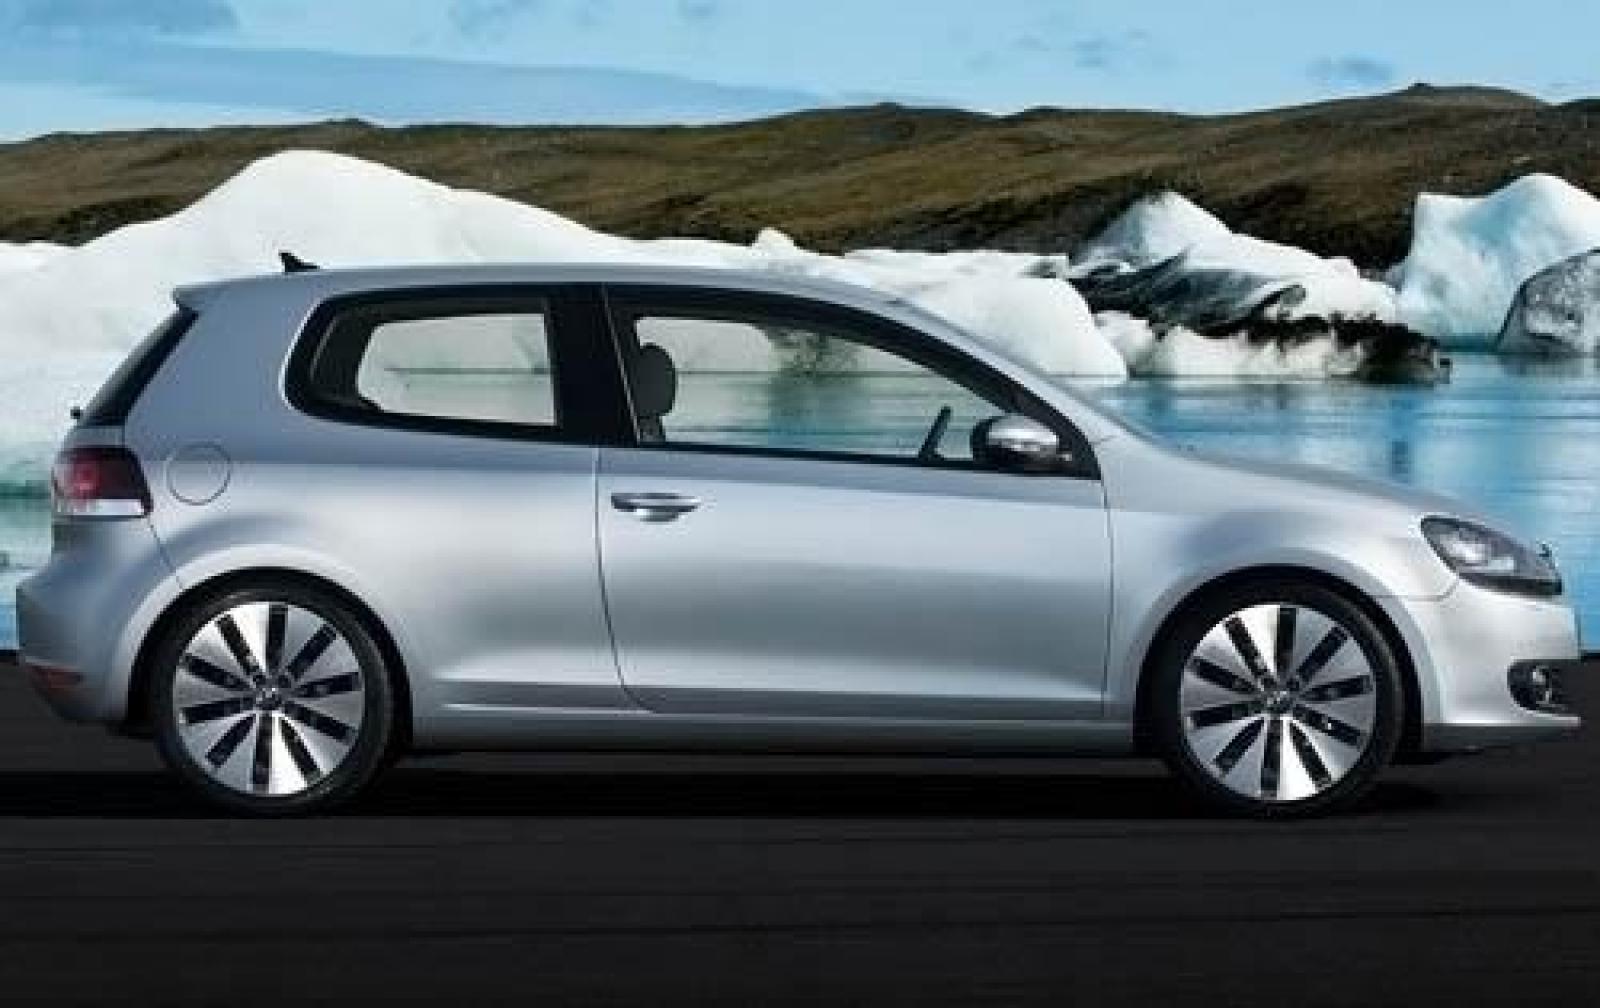 2011 Volkswagen Golf Information And Photos Zombiedrive